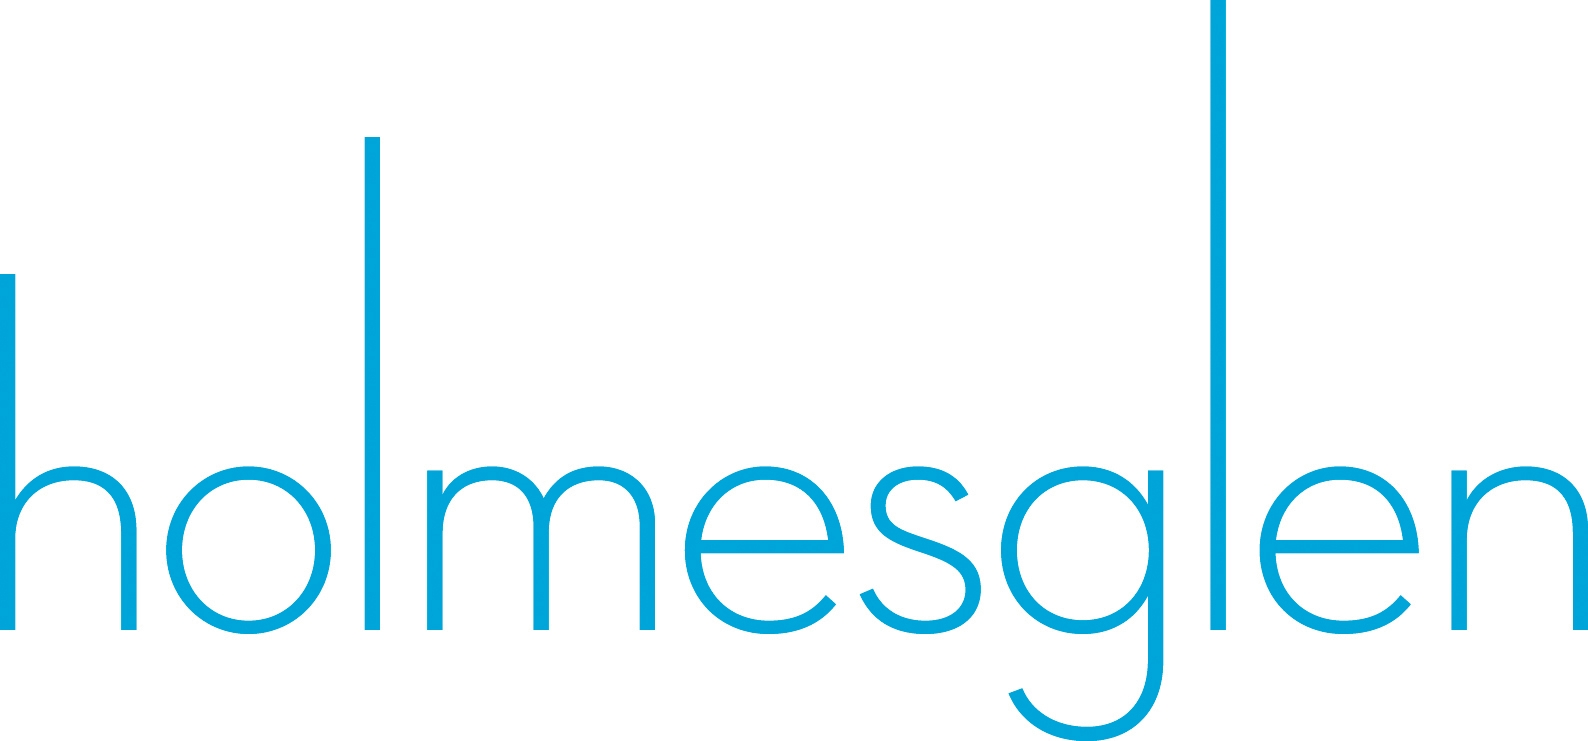 Holmesglen logo